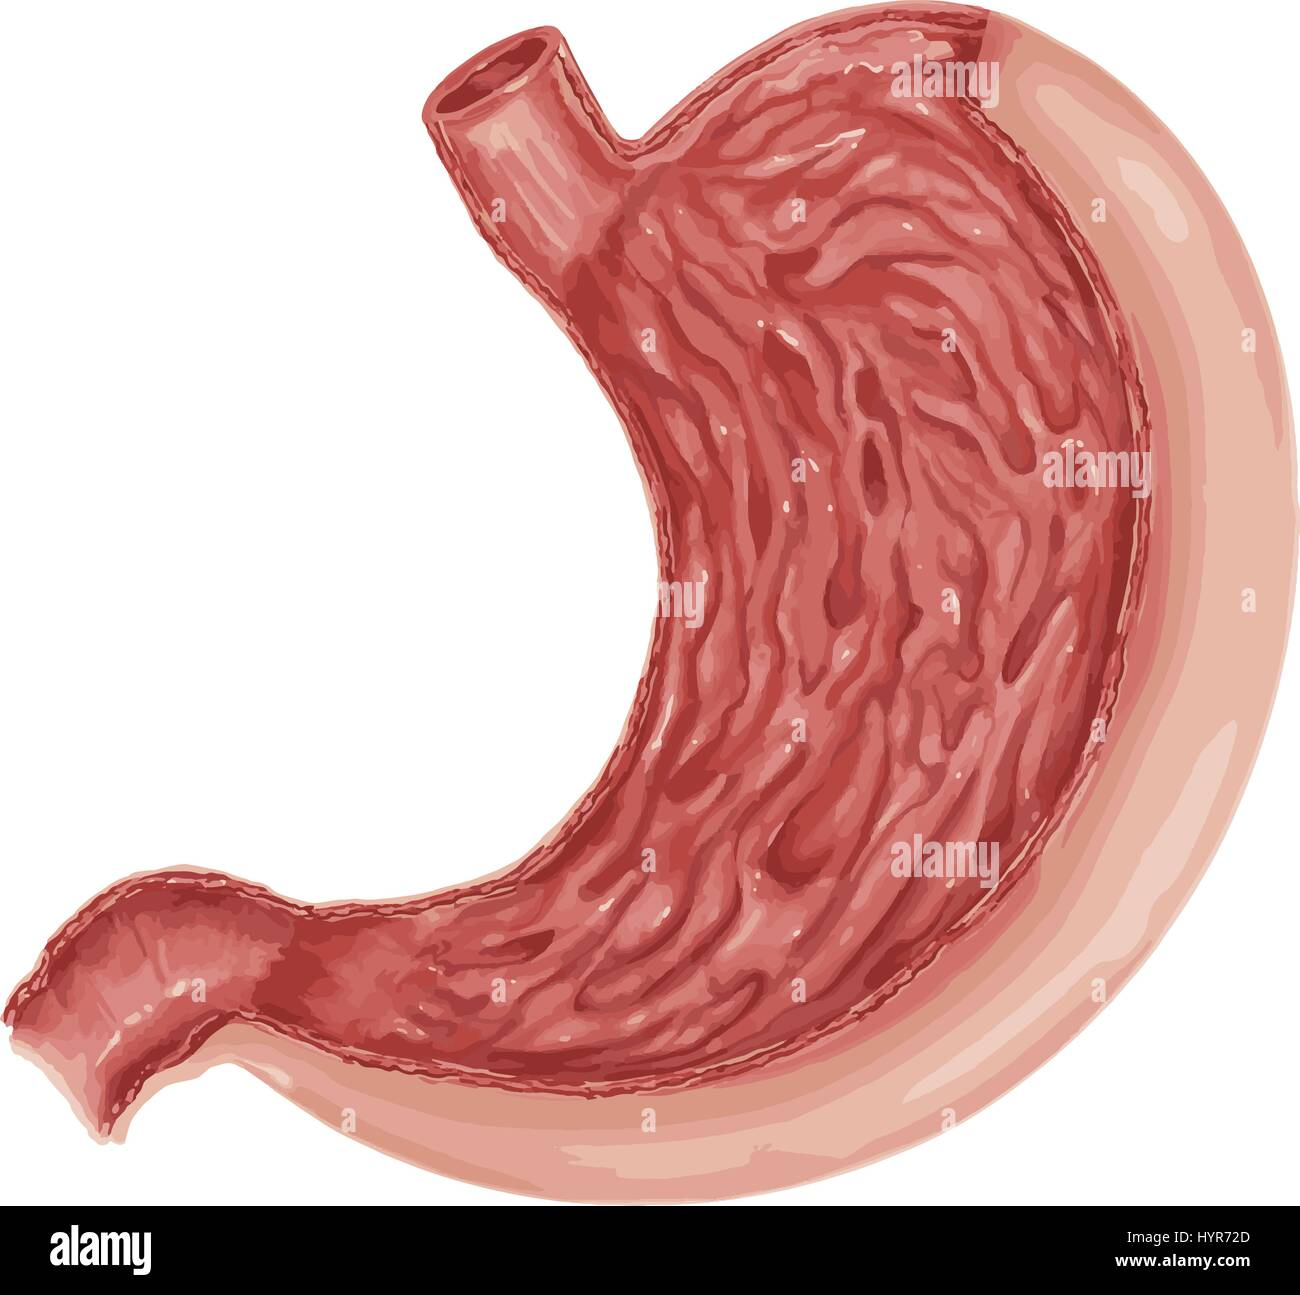 Illustration Of Diagram Of Human Stomach Anatomy Stock Vector Art